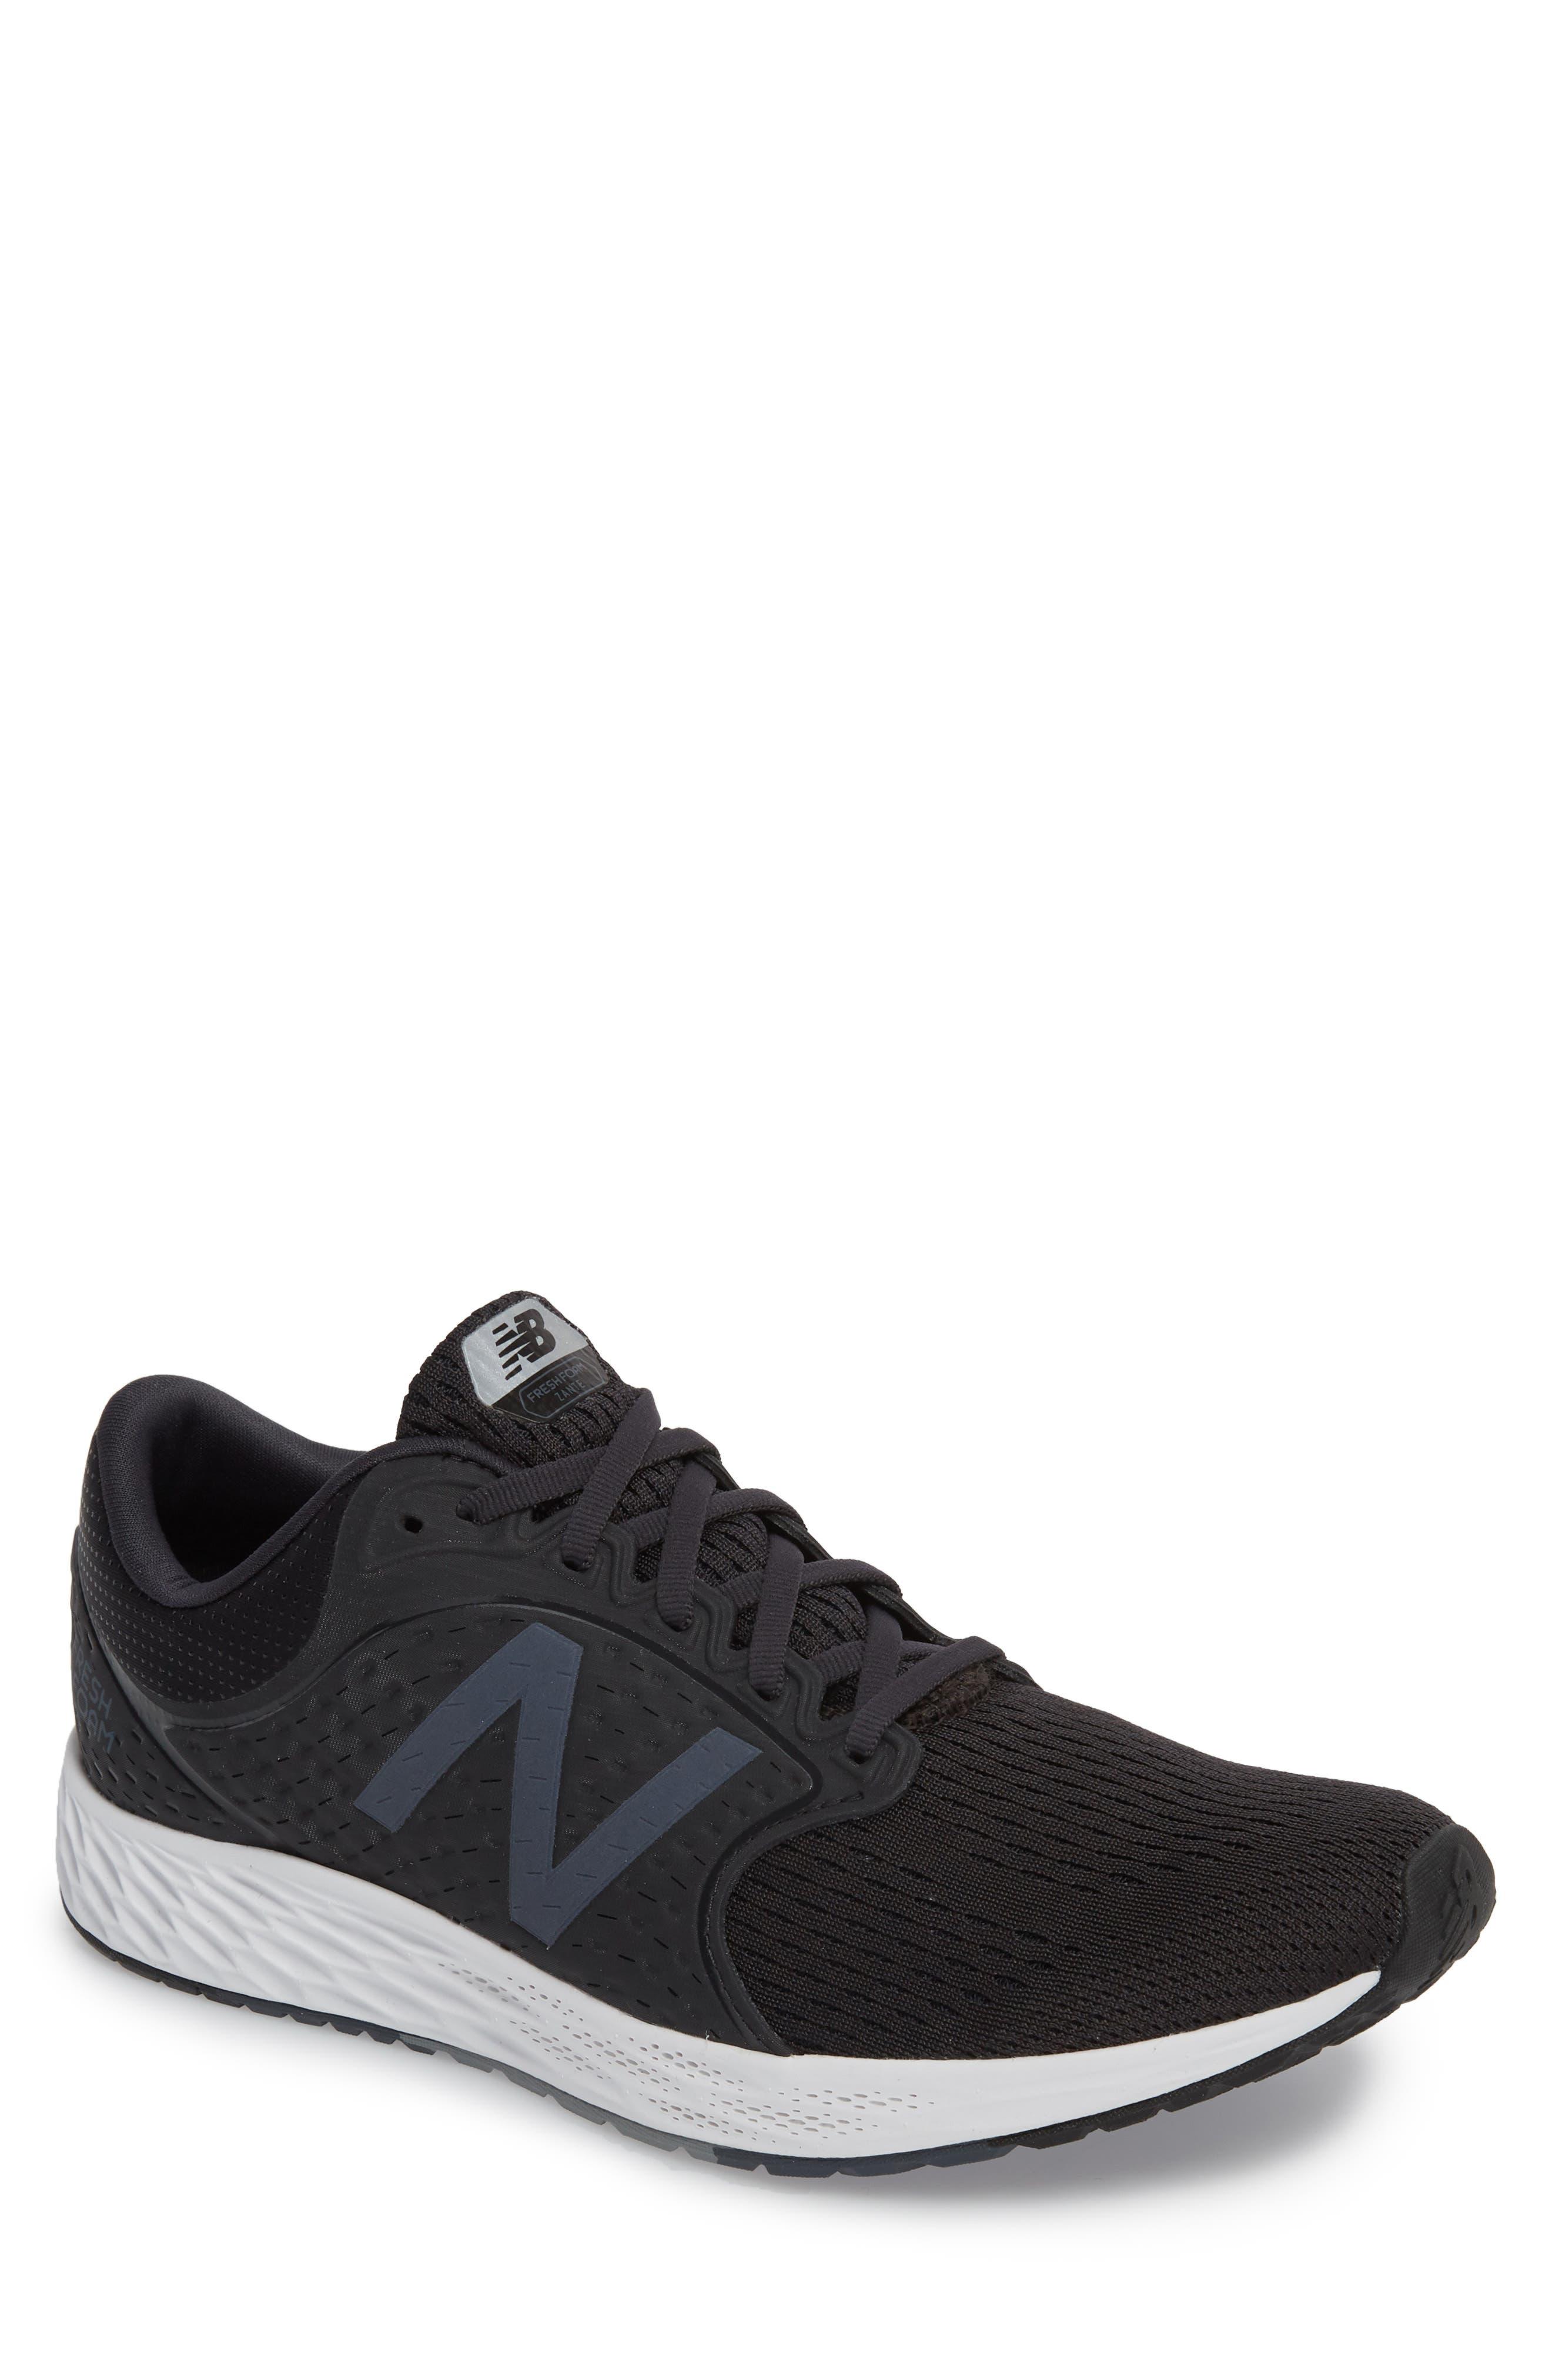 Fresh Foam Zante v4 Sneaker,                             Main thumbnail 1, color,                             BLACK